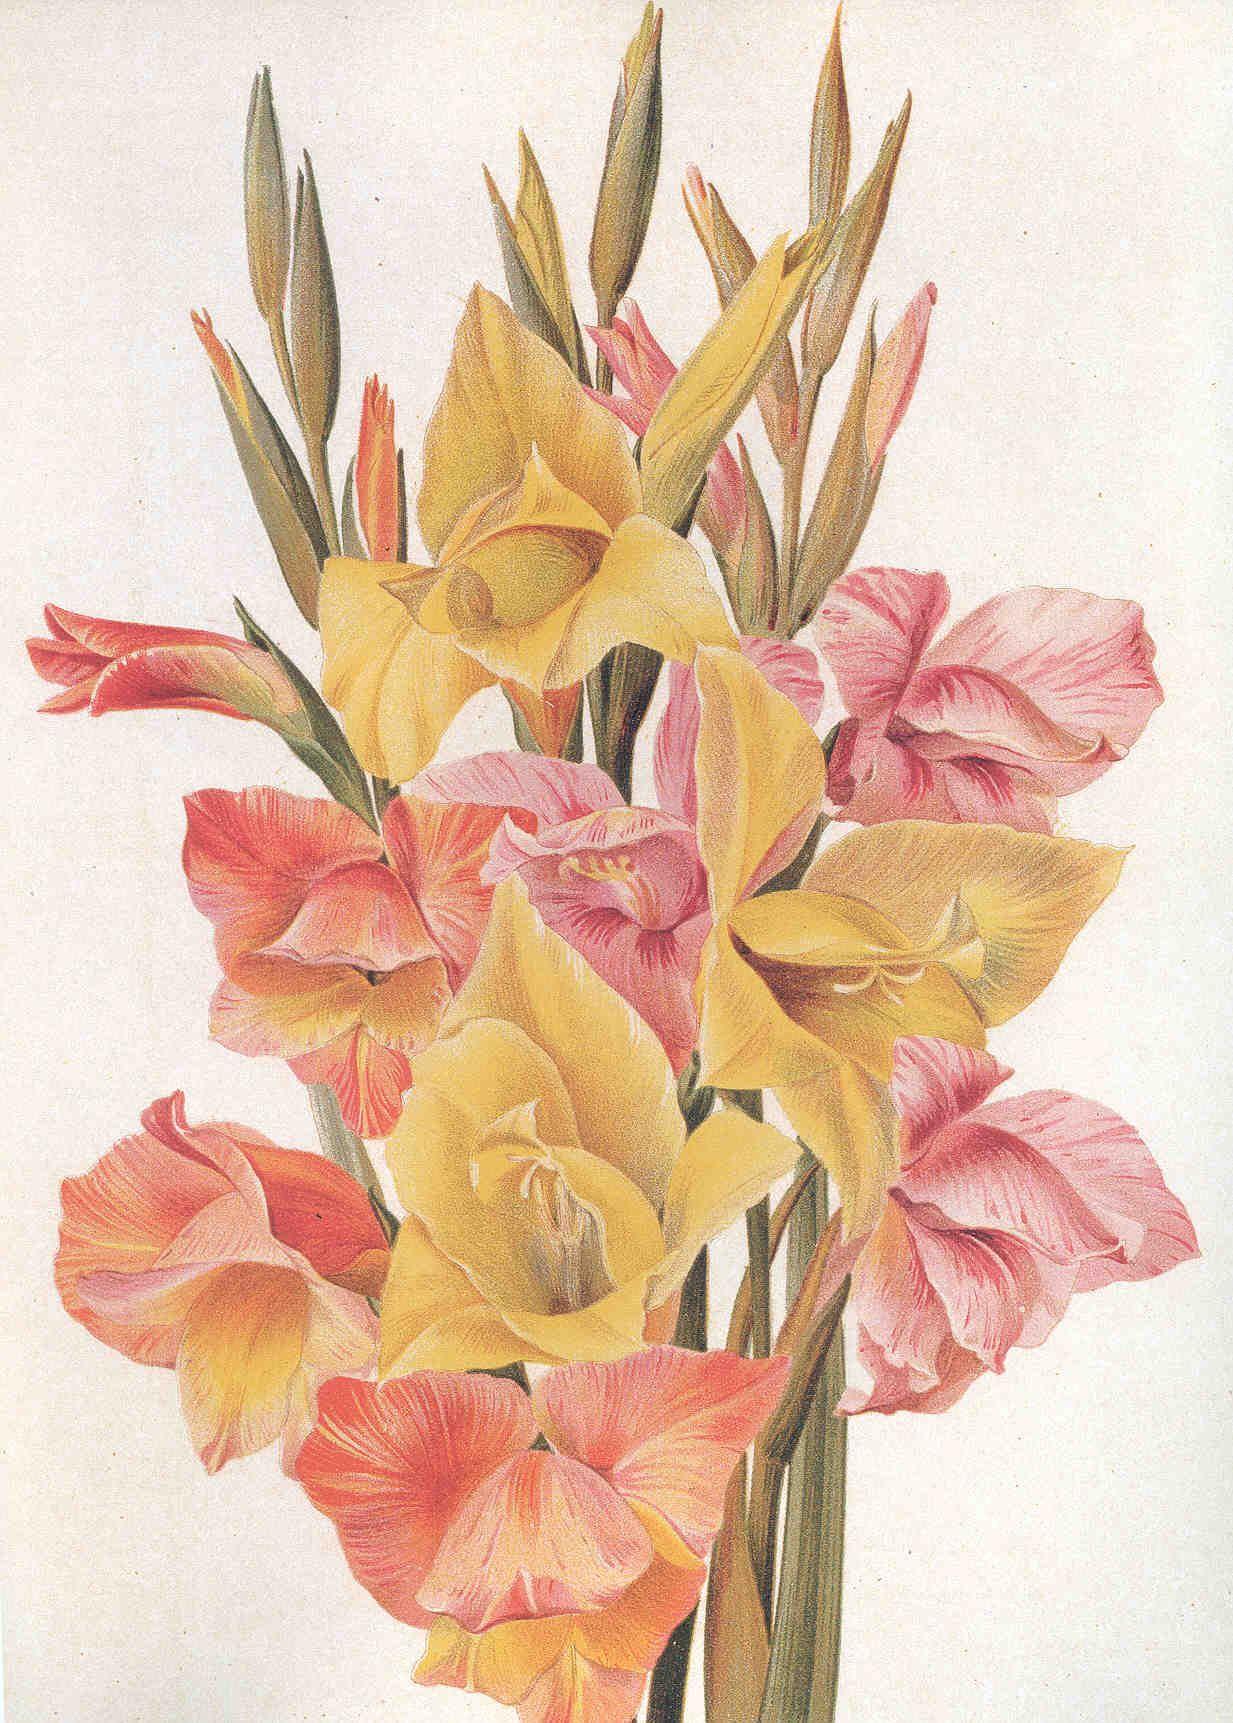 gladiolus botanical illustration - Google Search